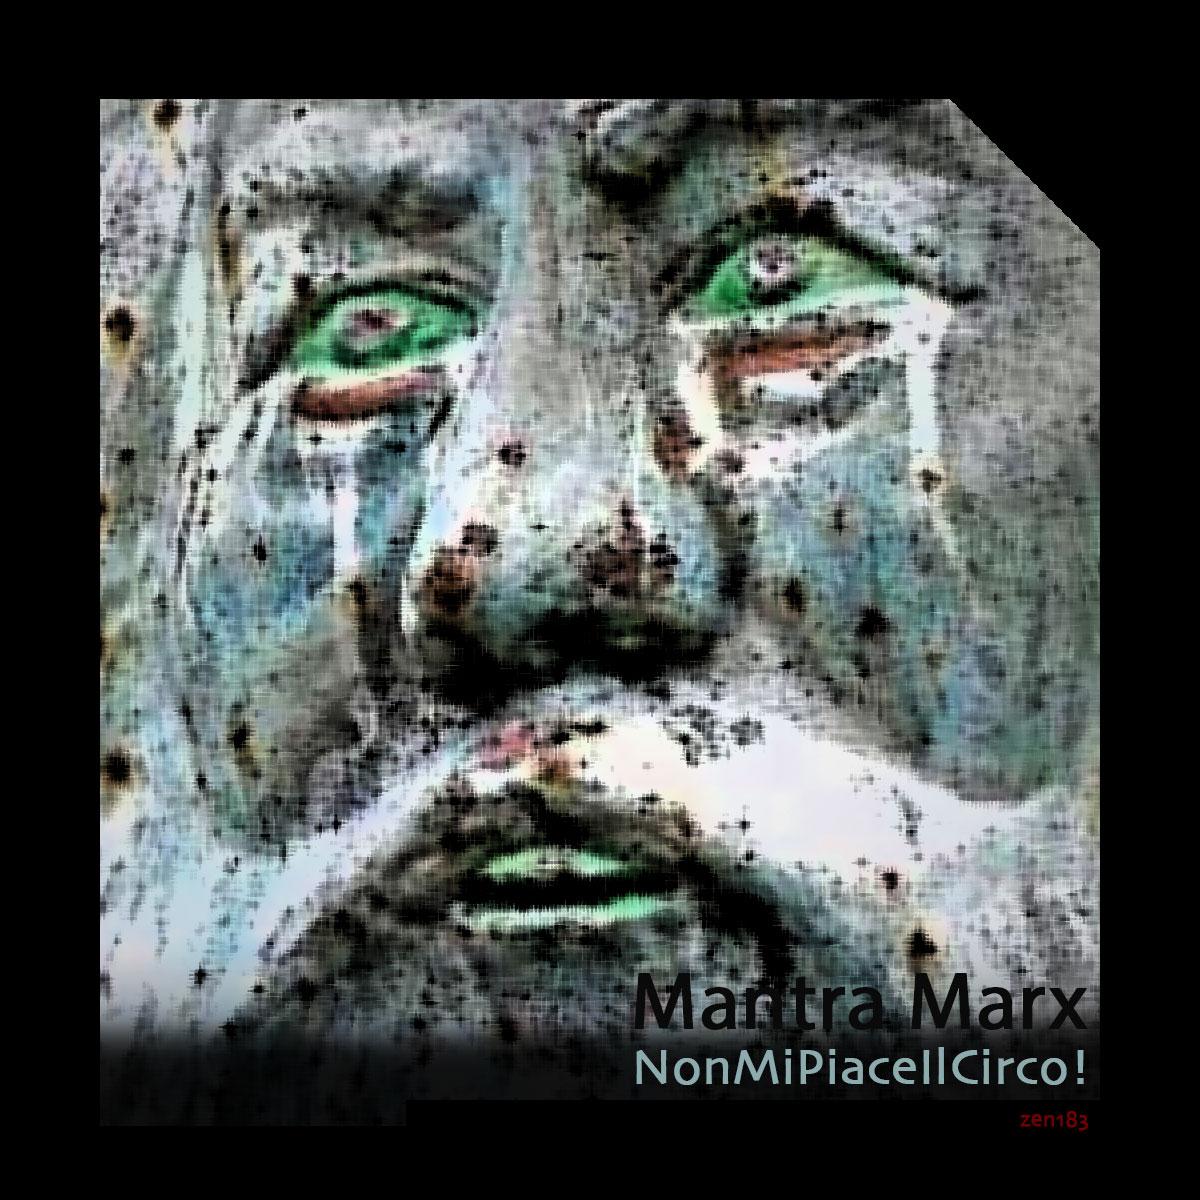 NonMiPiaceIlCirco! – Mantra Marx